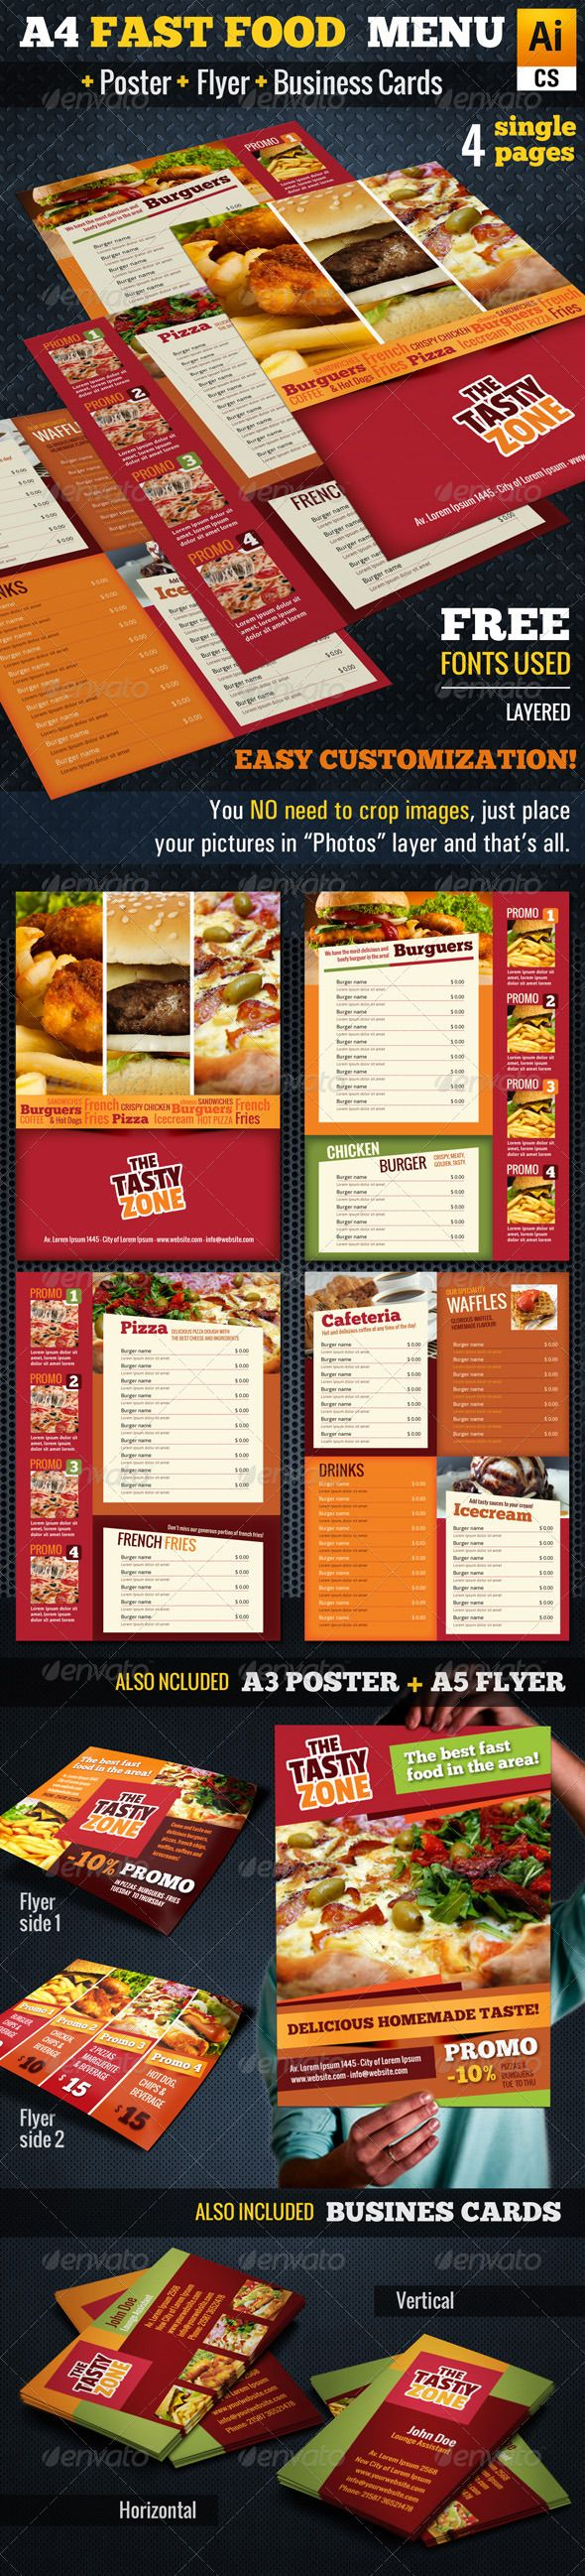 A4 Fast Food Menu + Poster + Flyer + Cards - Food Menus Print Templates